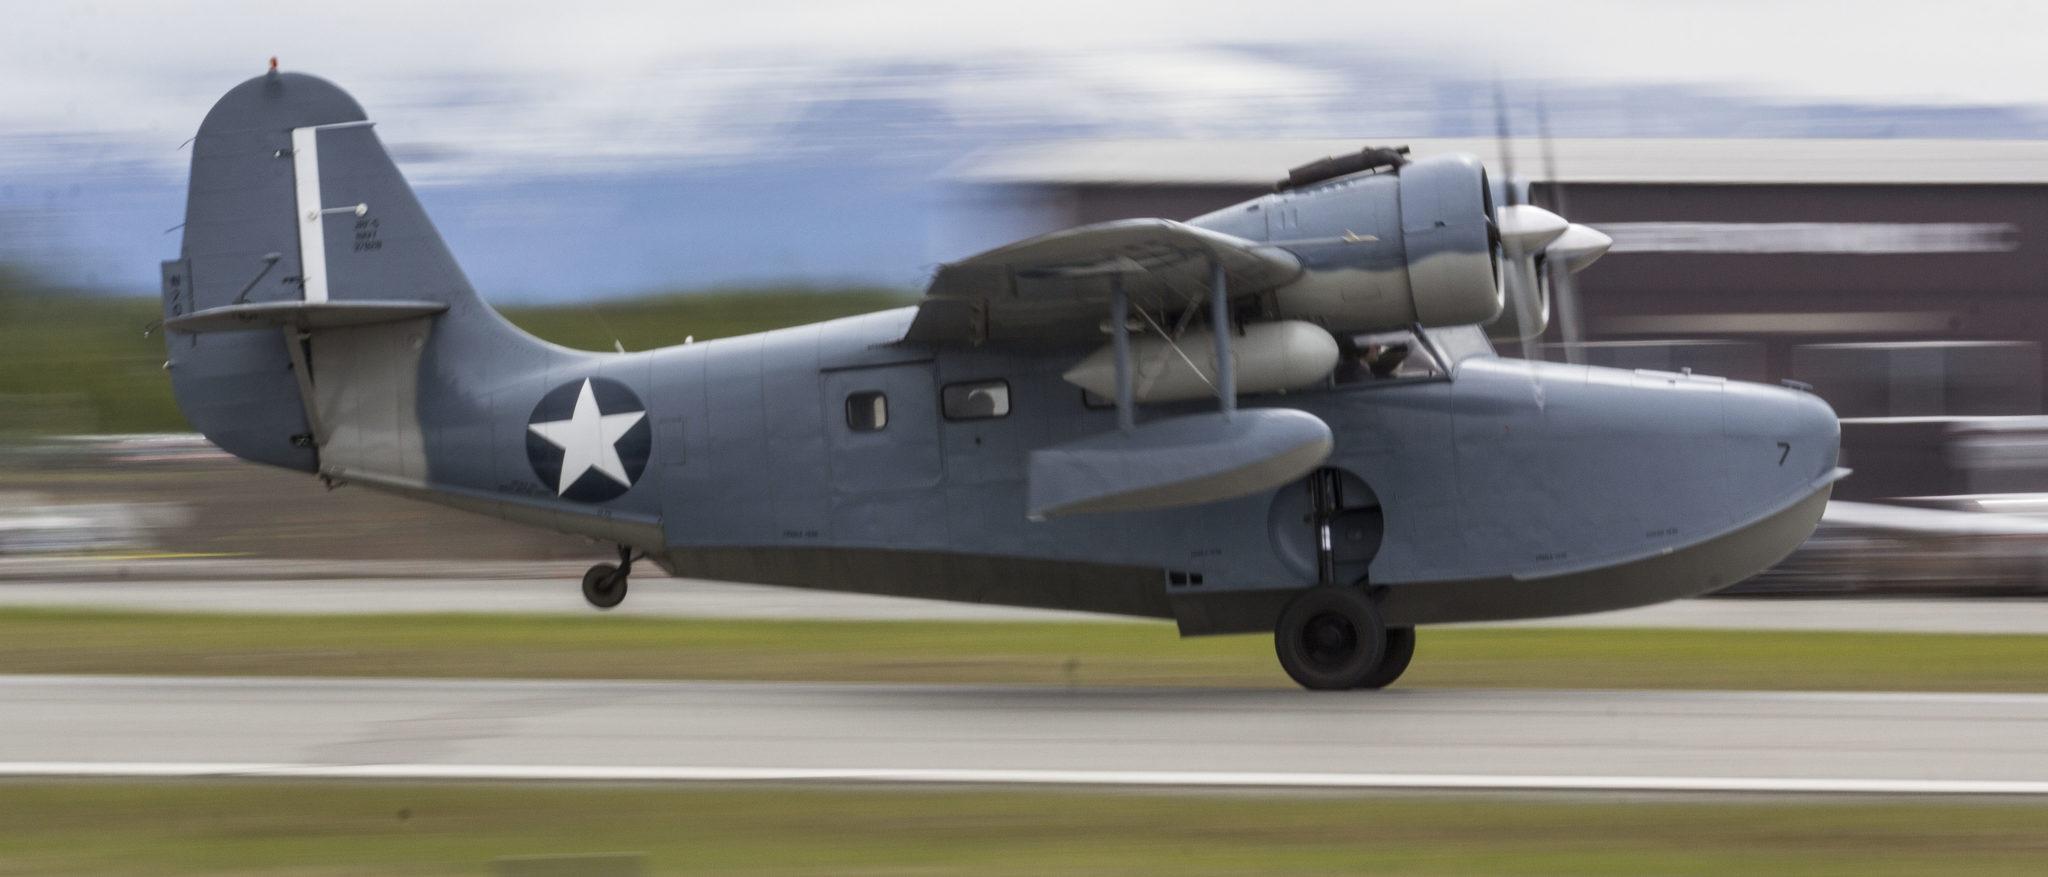 Grumman Goose at Merrill Field take off   Alaskafoto - Top Alaska photography & aircraft portraits